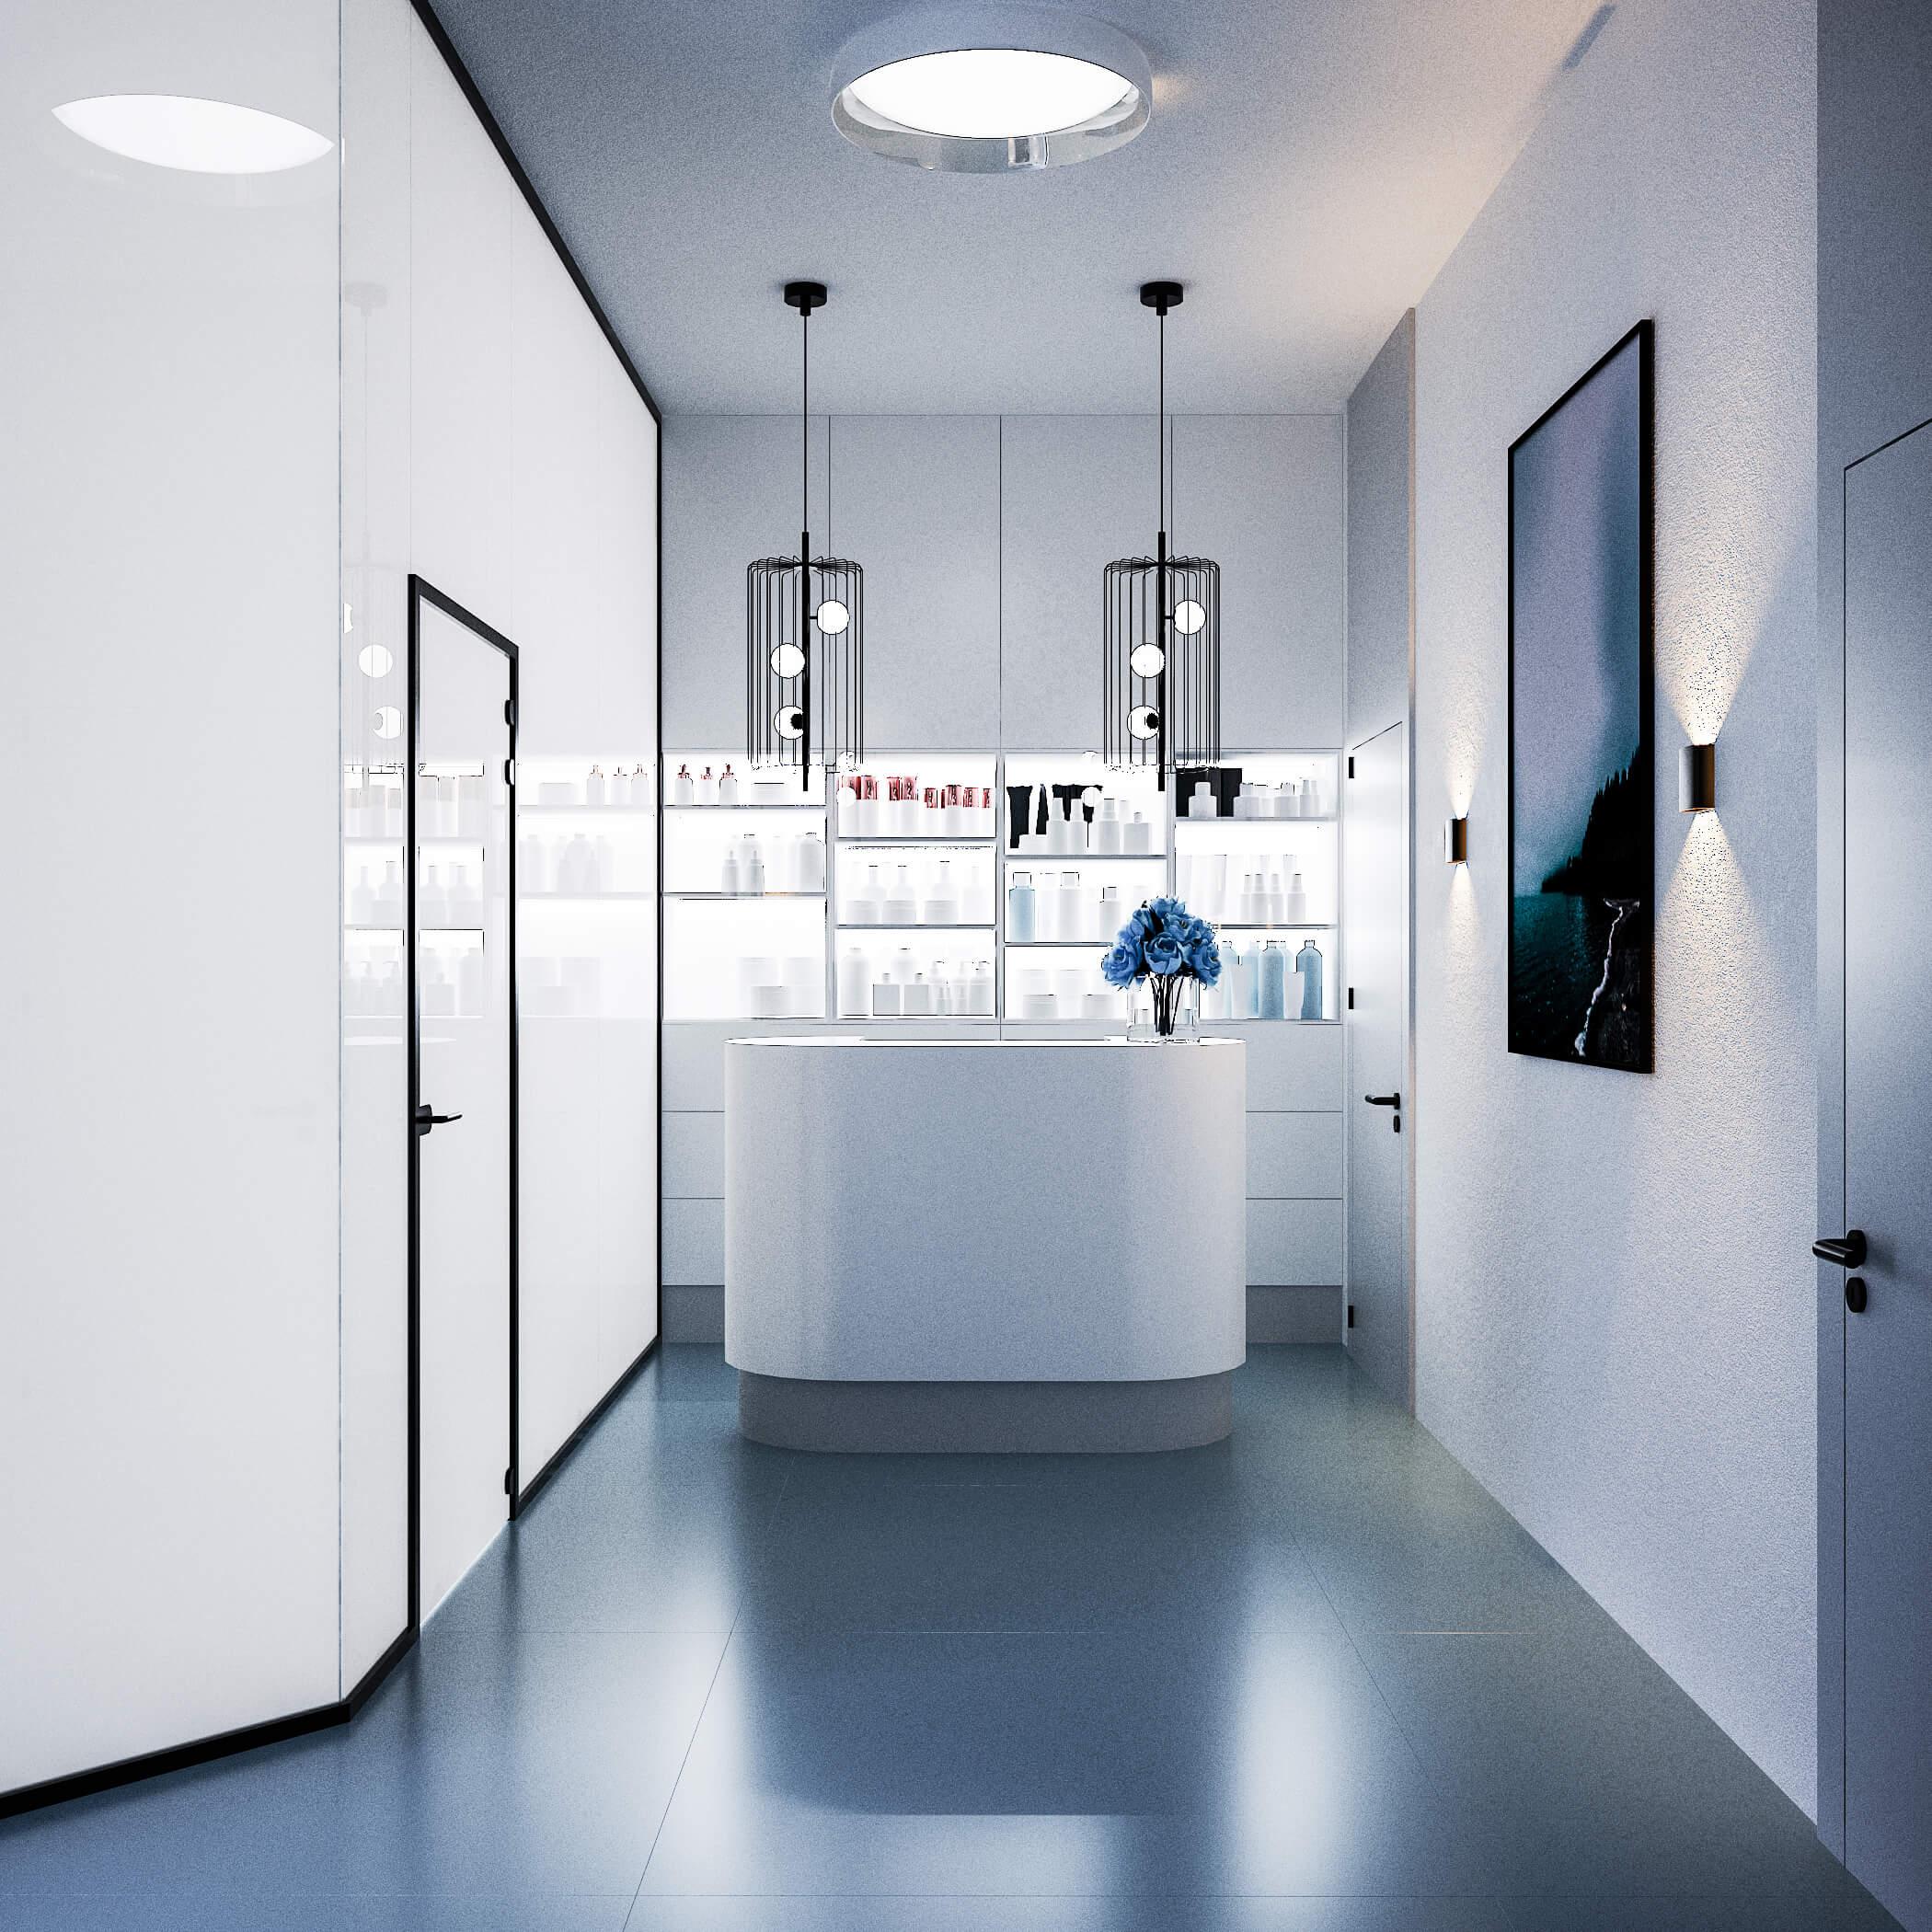 Centrum Medycyny Estetycznej i Stomatologii